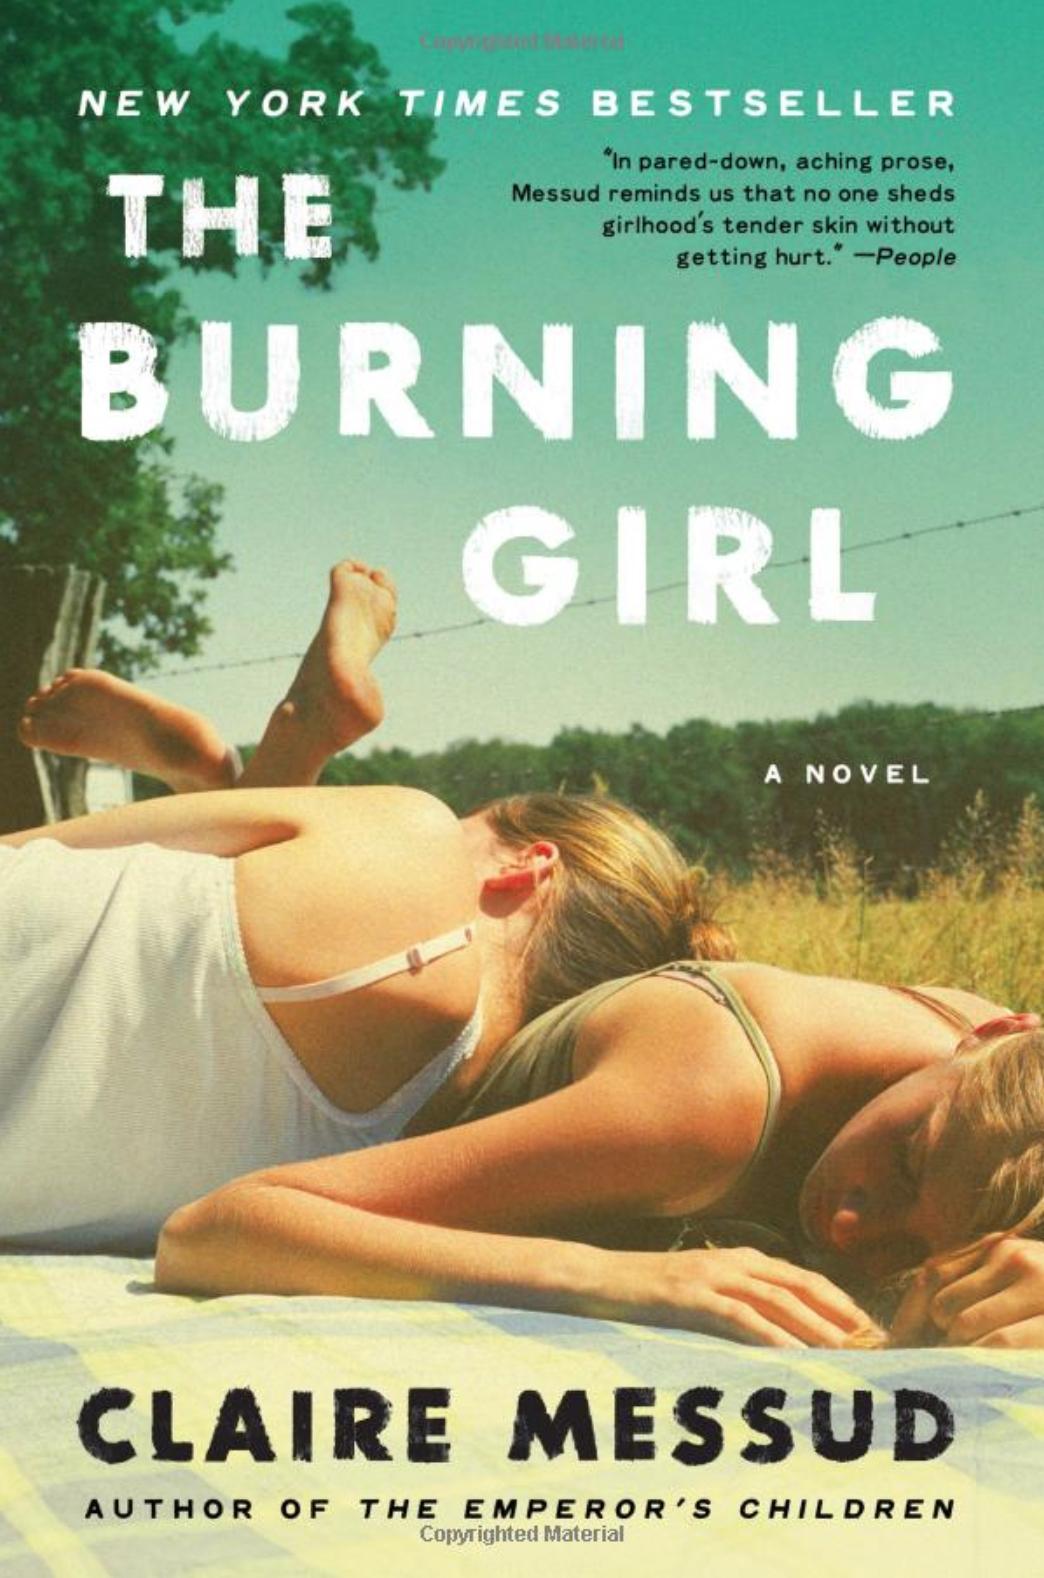 kathleen stone writer booklab literary salon the burning girl claire messud